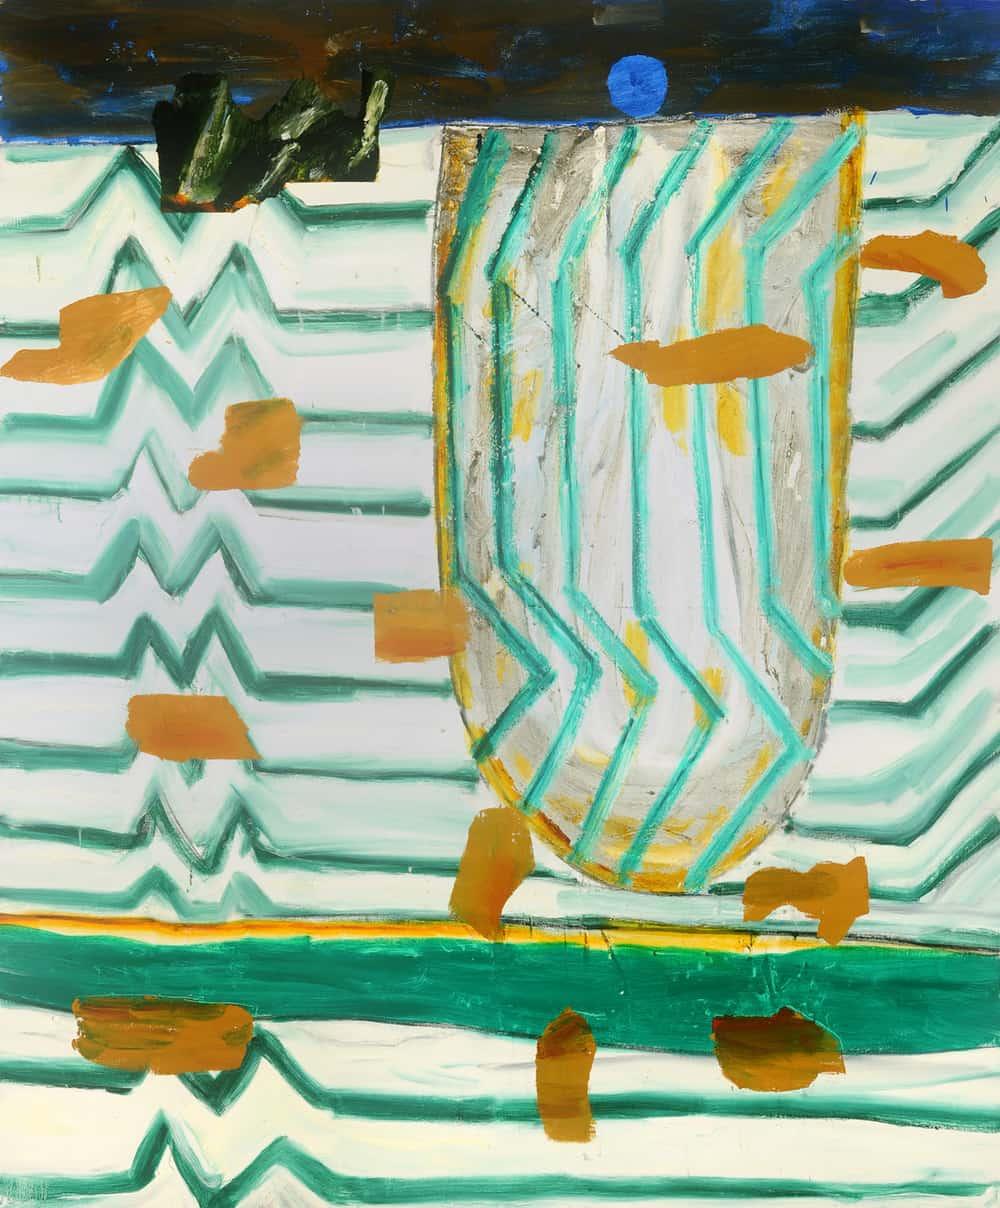 Island, John Walker, painter